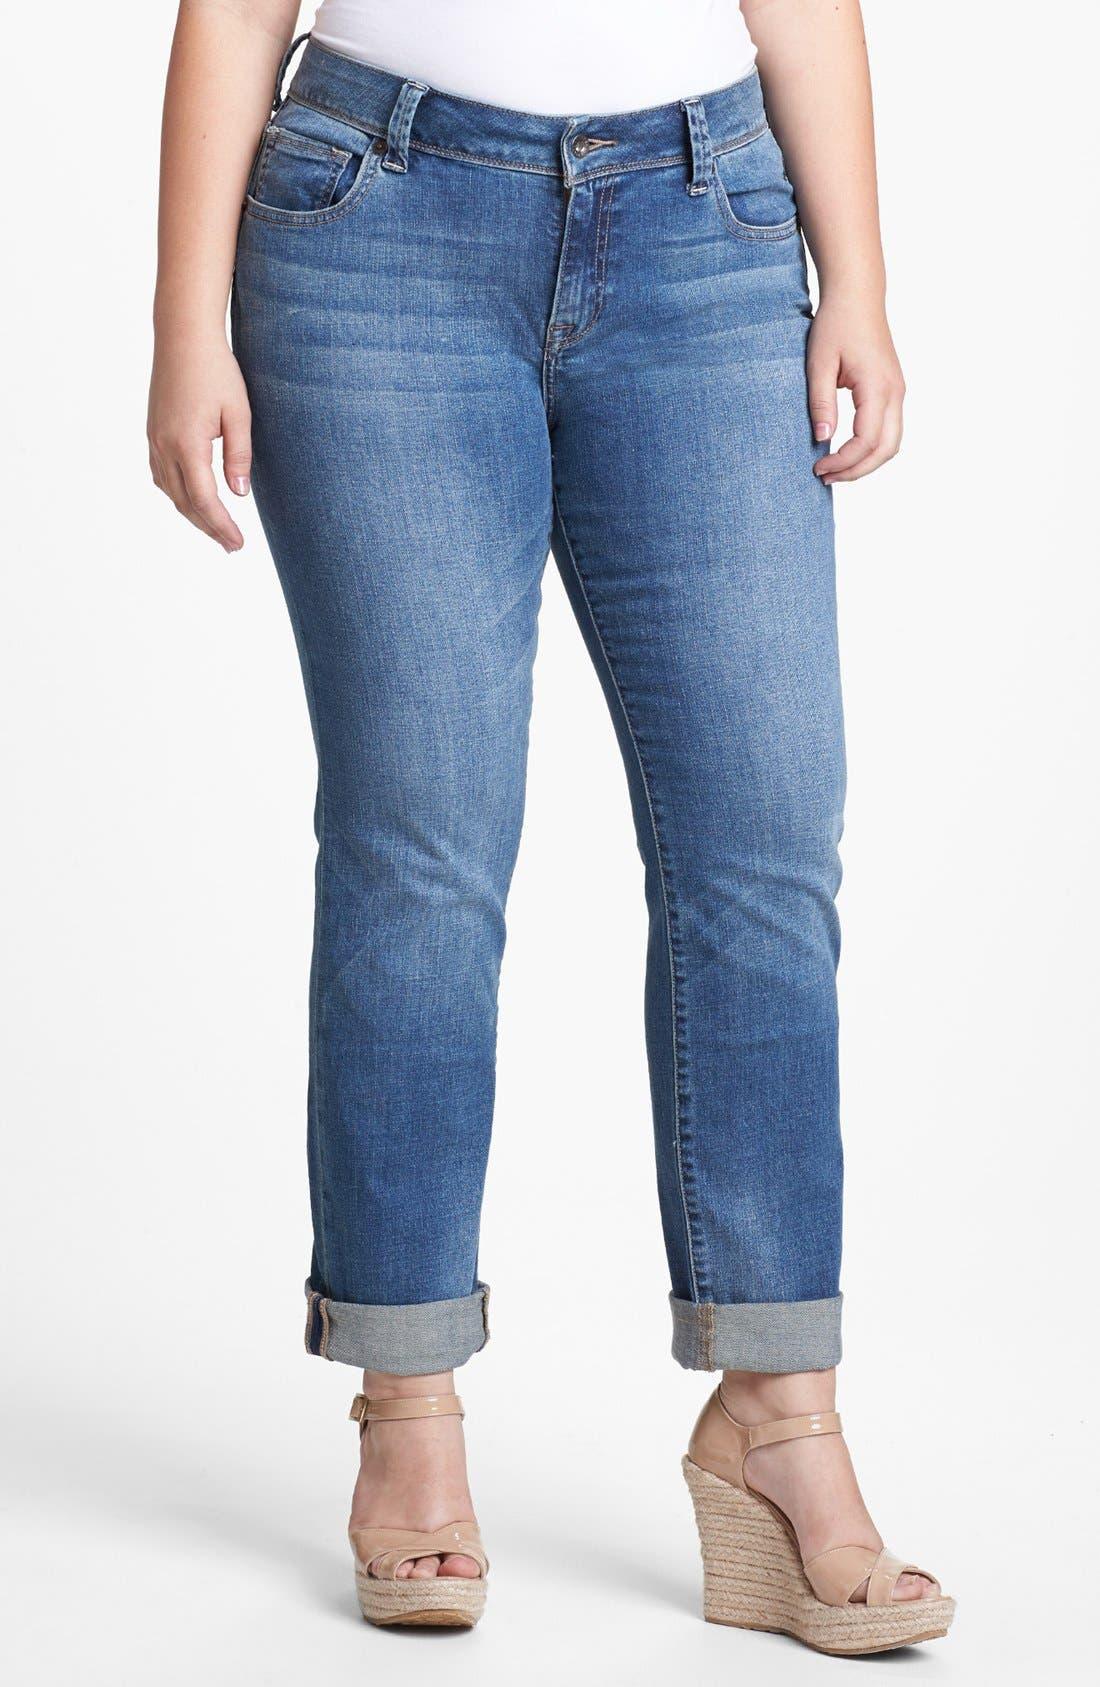 Alternate Image 1 Selected - Lucky Brand 'Ginger' Straight Leg Jeans (Plus Size)